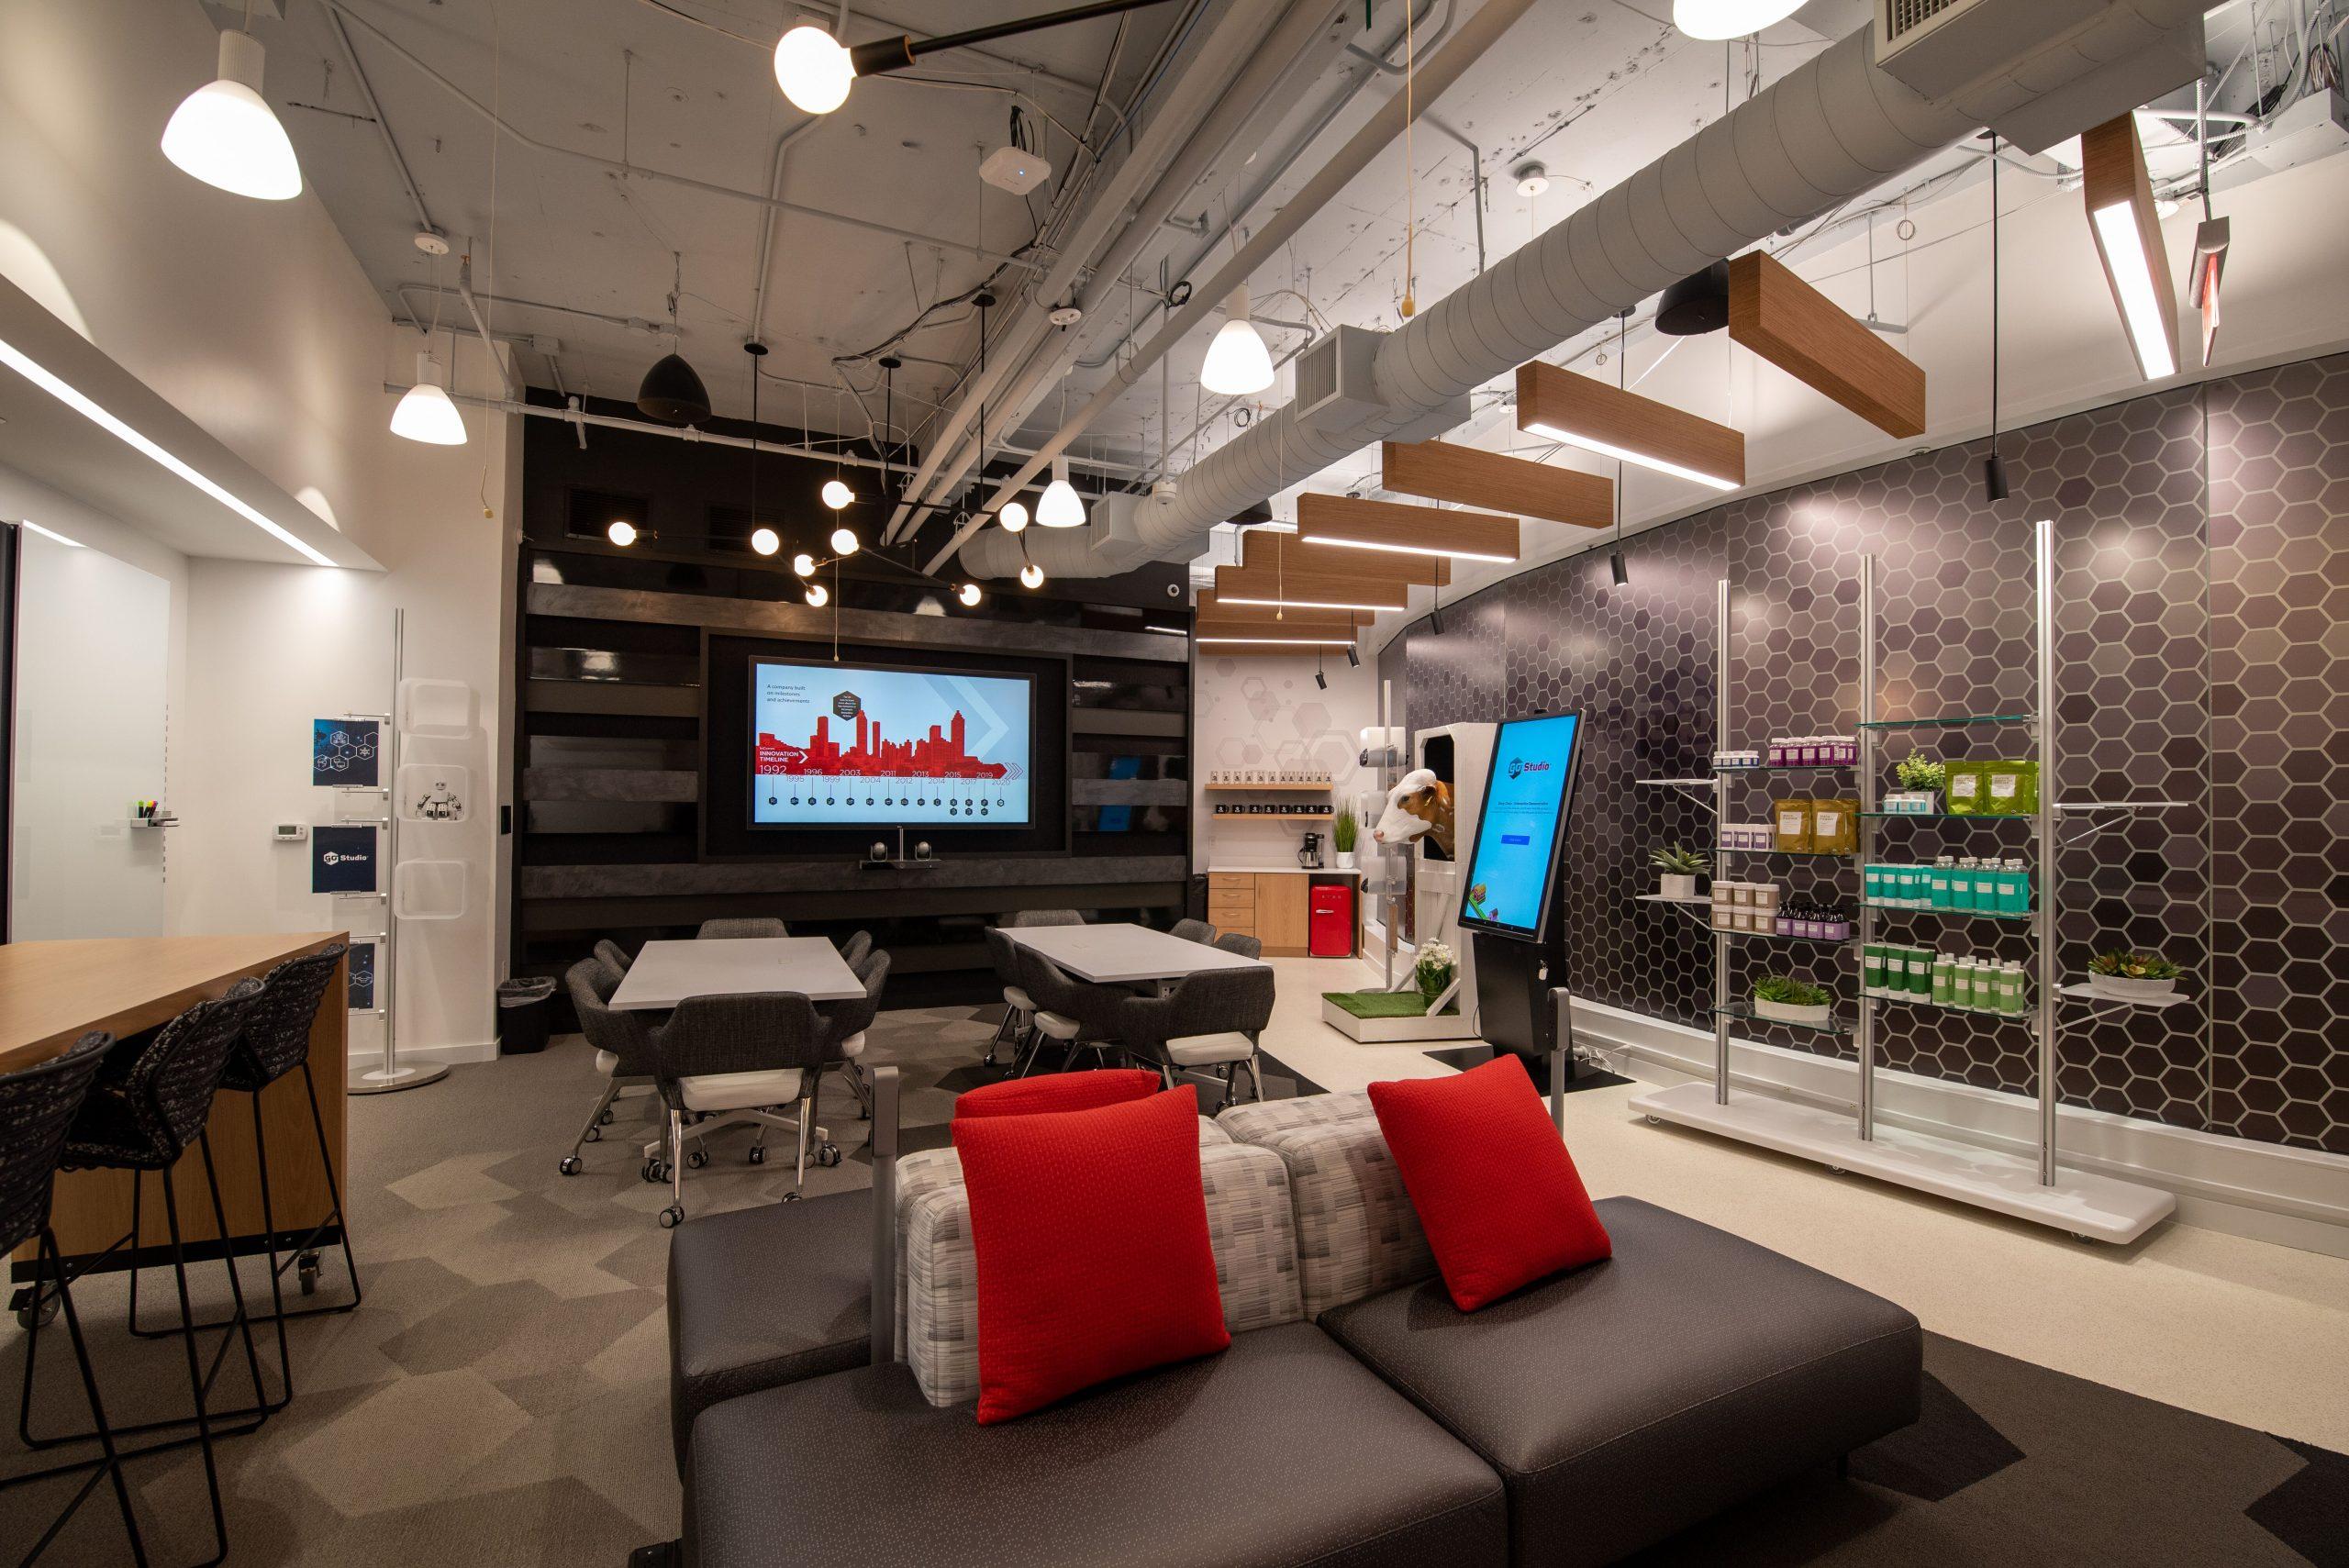 InComm Launches Go StudioTM, an Emerging Technologies Incubator